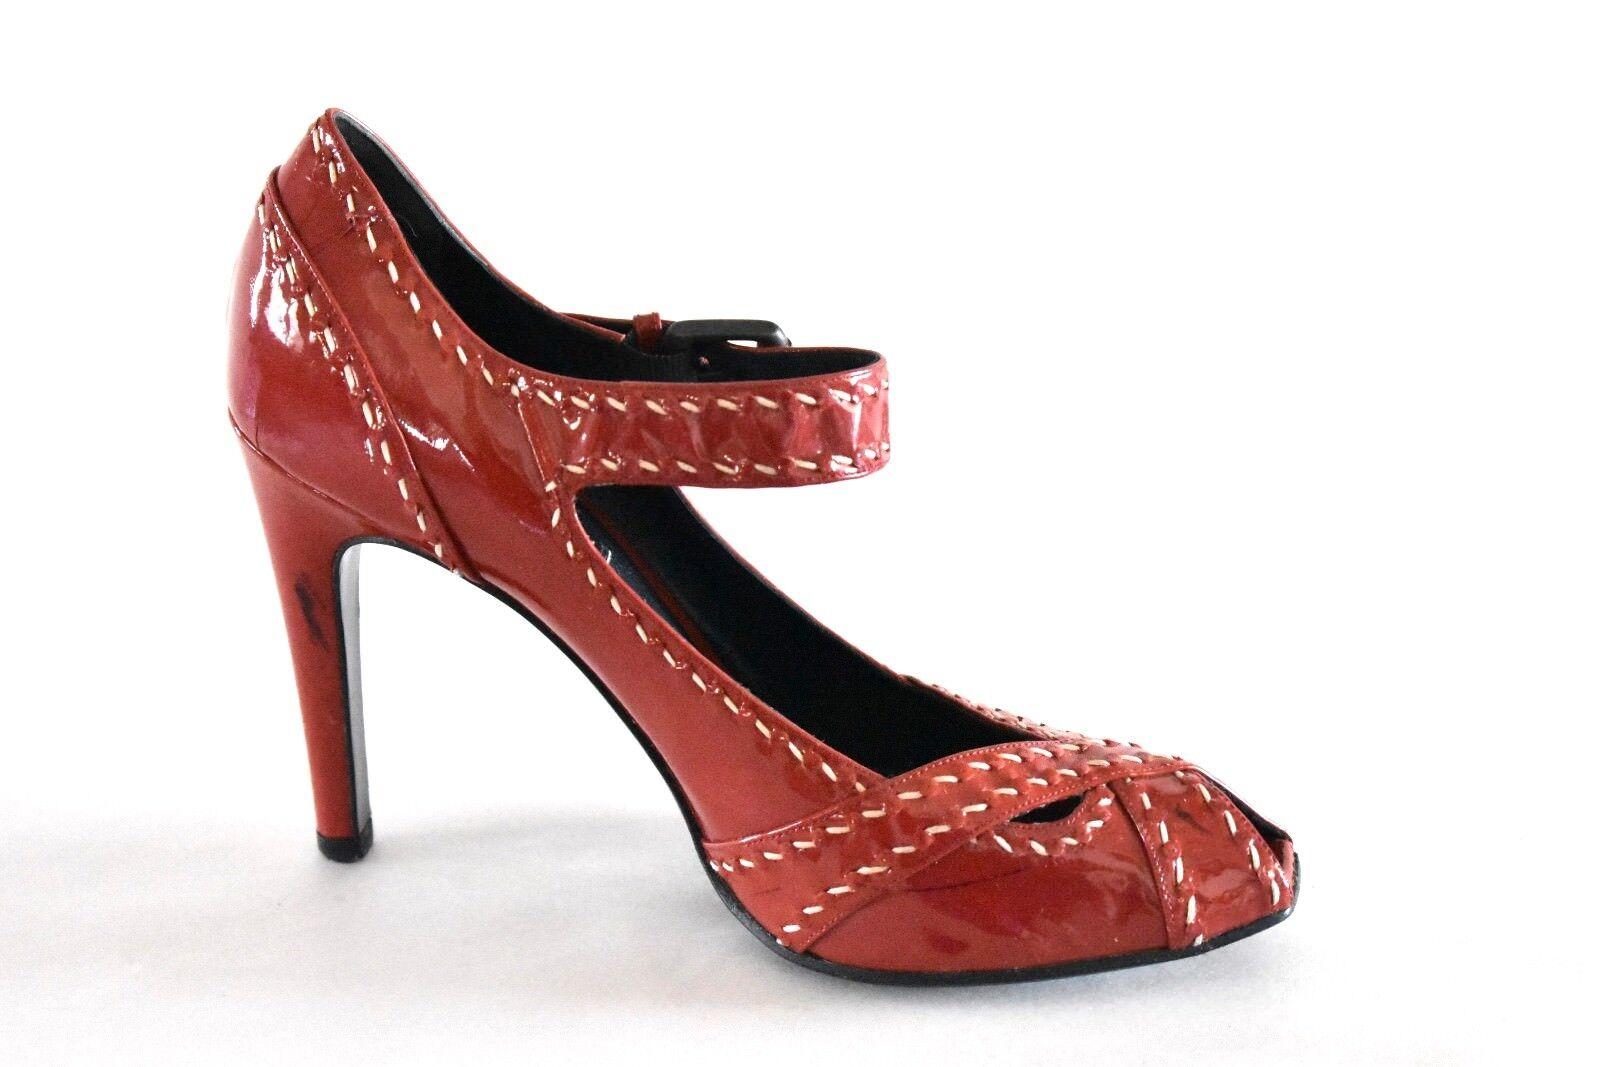 nuovo stile Bottega Bottega Bottega Veneta Patent Leather Mary Jane Peep Toe Pumps 38 - Made In ITALY  fino al 60% di sconto